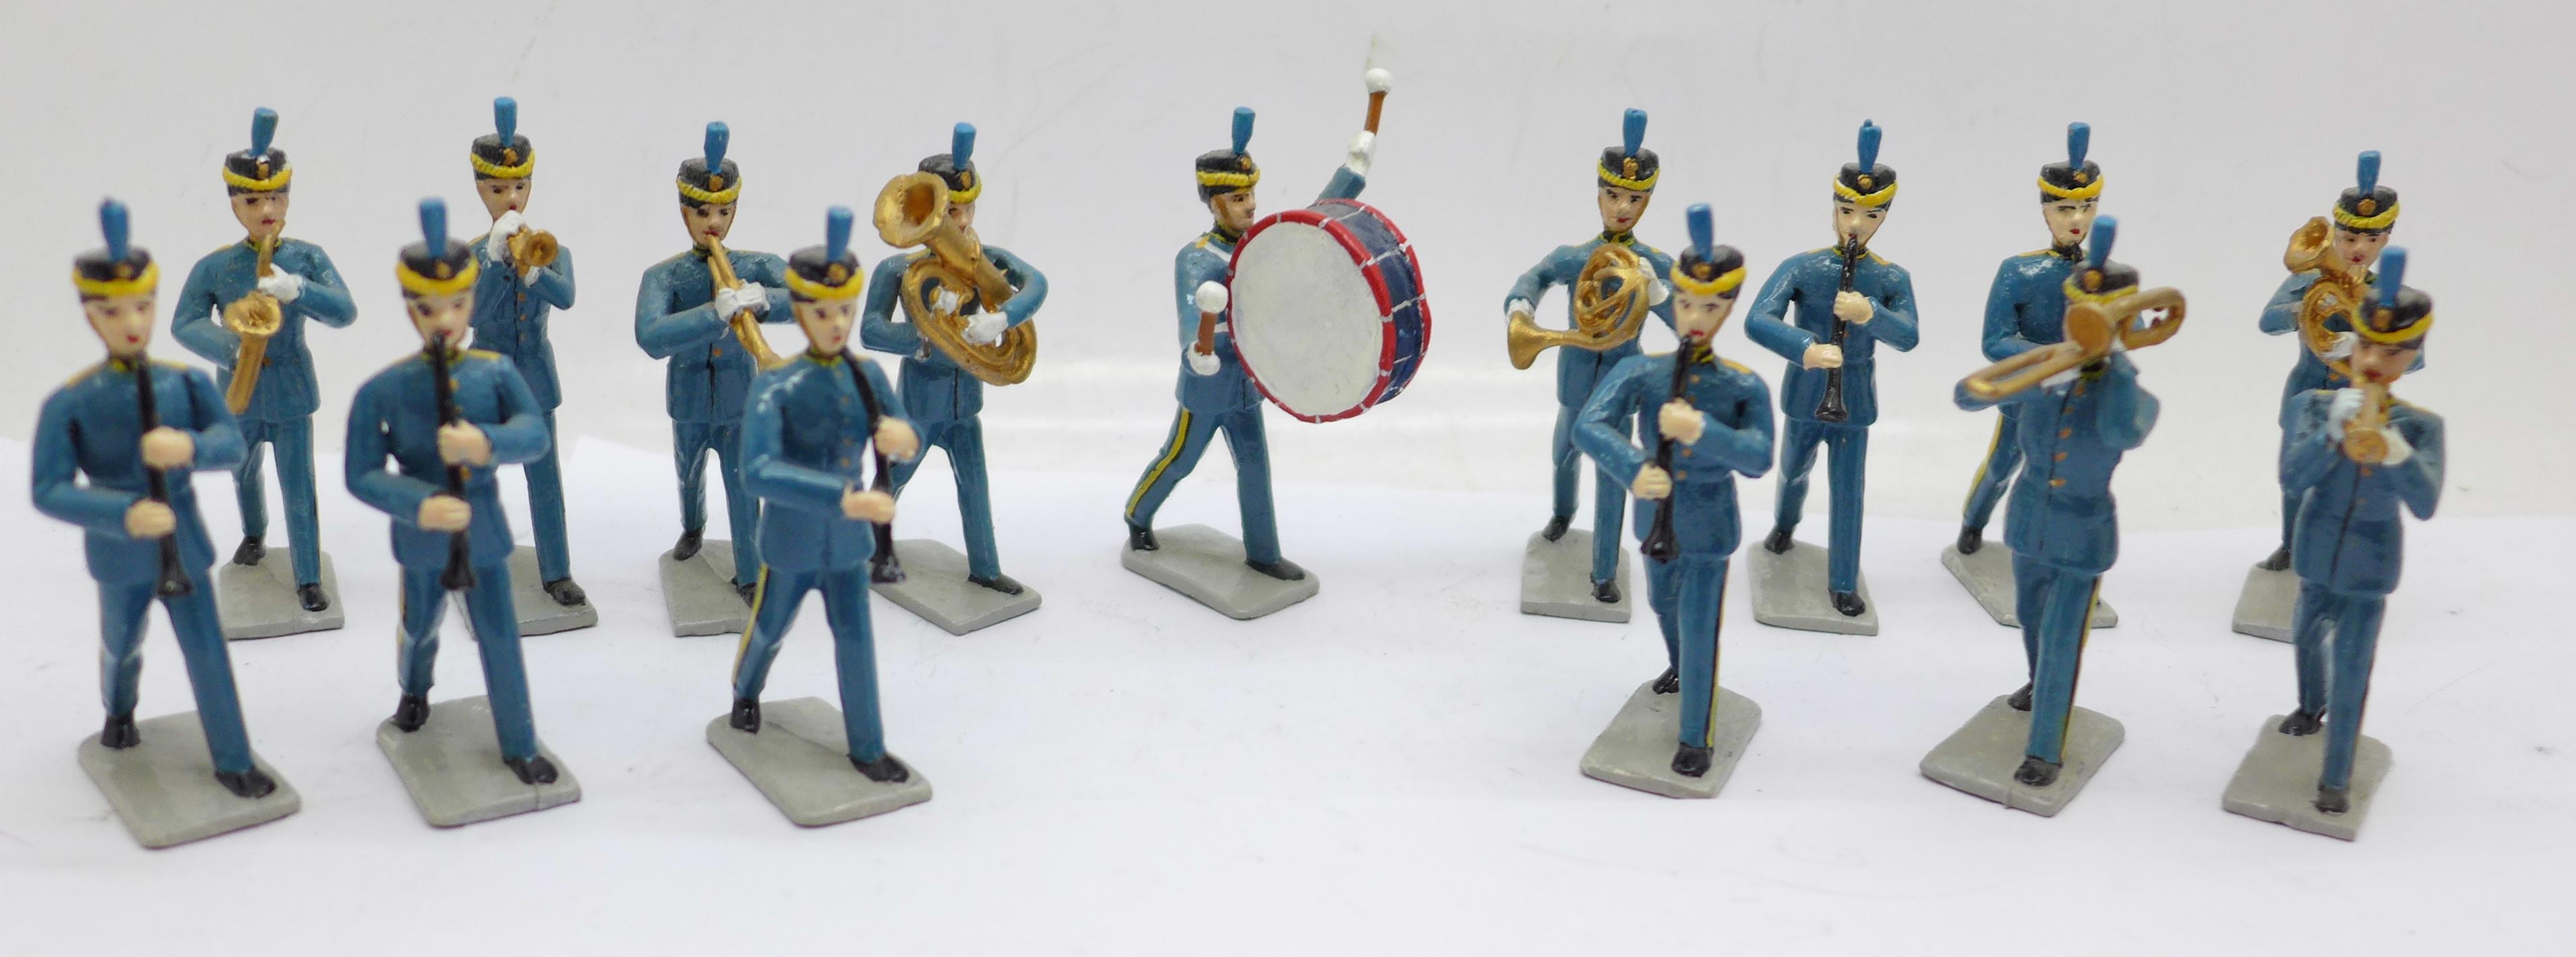 Fifteen metal marching band figures